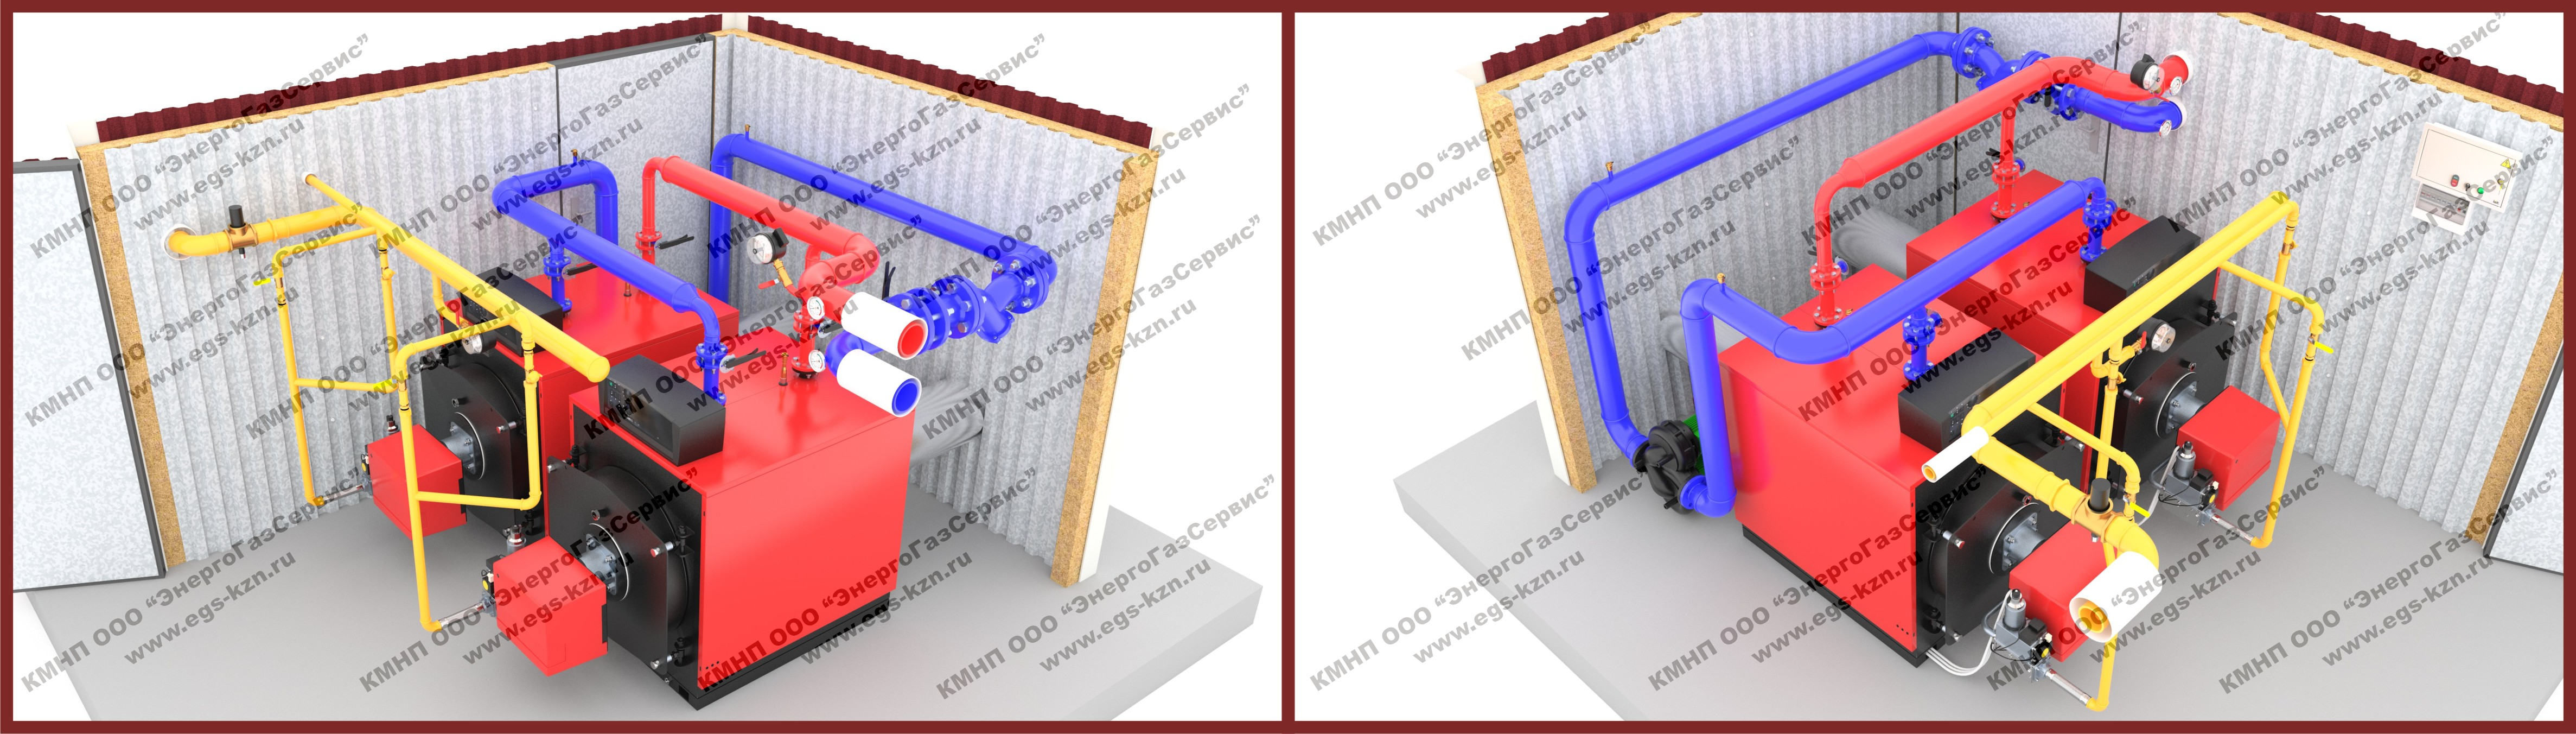 инструкция эксплуатация здаия цеха